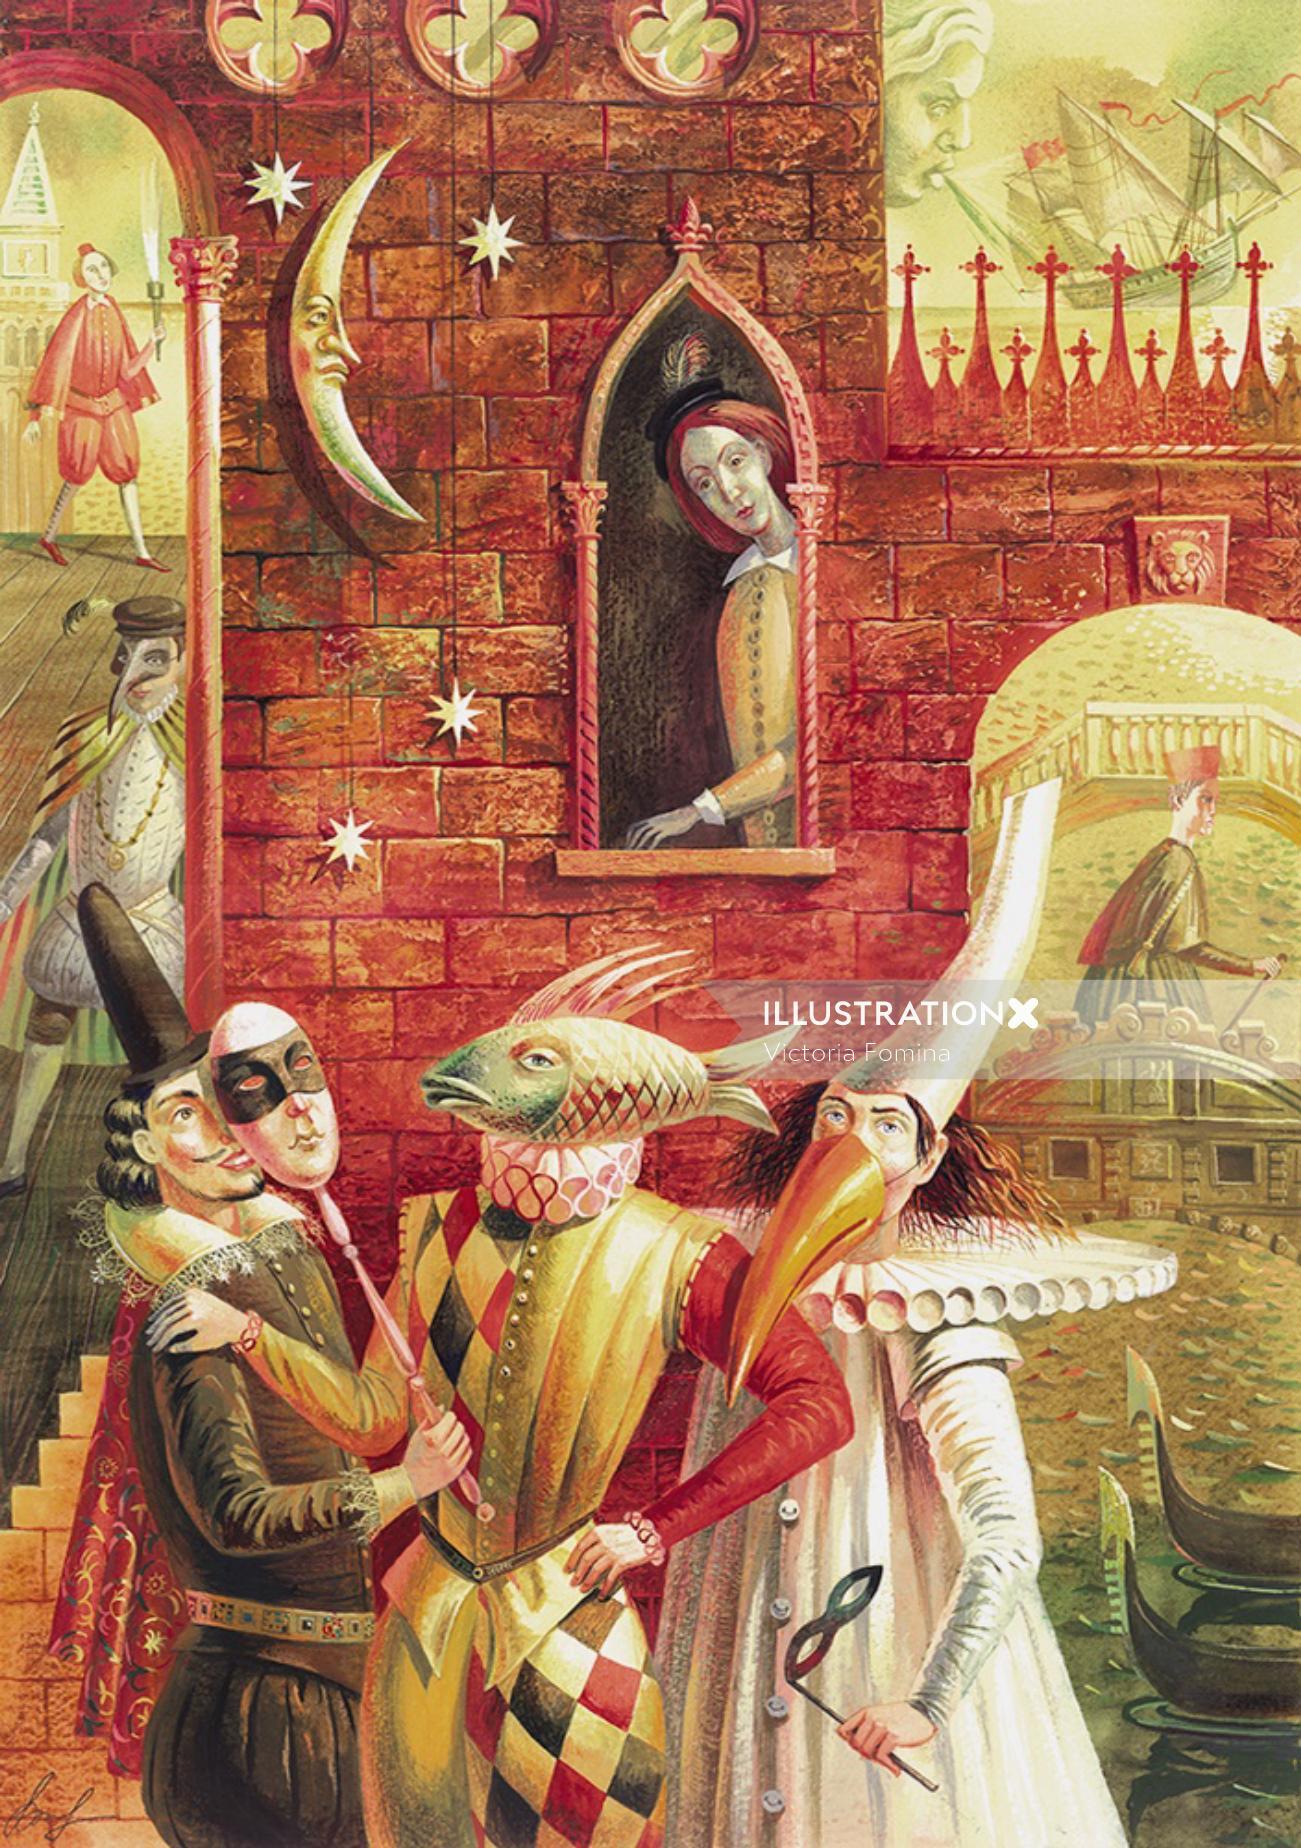 Fantasy poster A Merchant of Venice, Pan Press